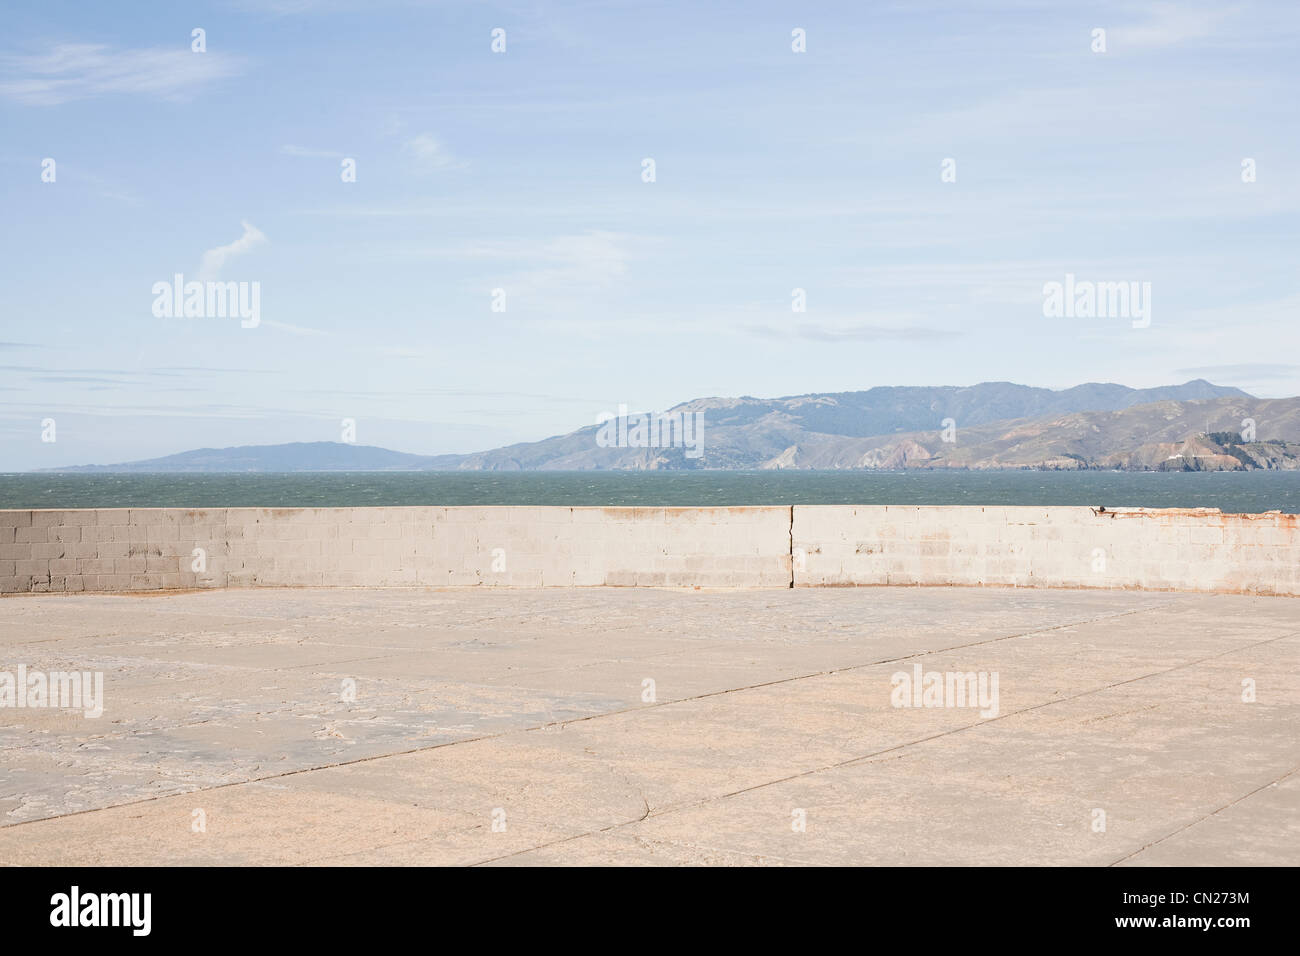 Leere Aussichtspunkt, San Francisco, Kalifornien, USA Stockbild